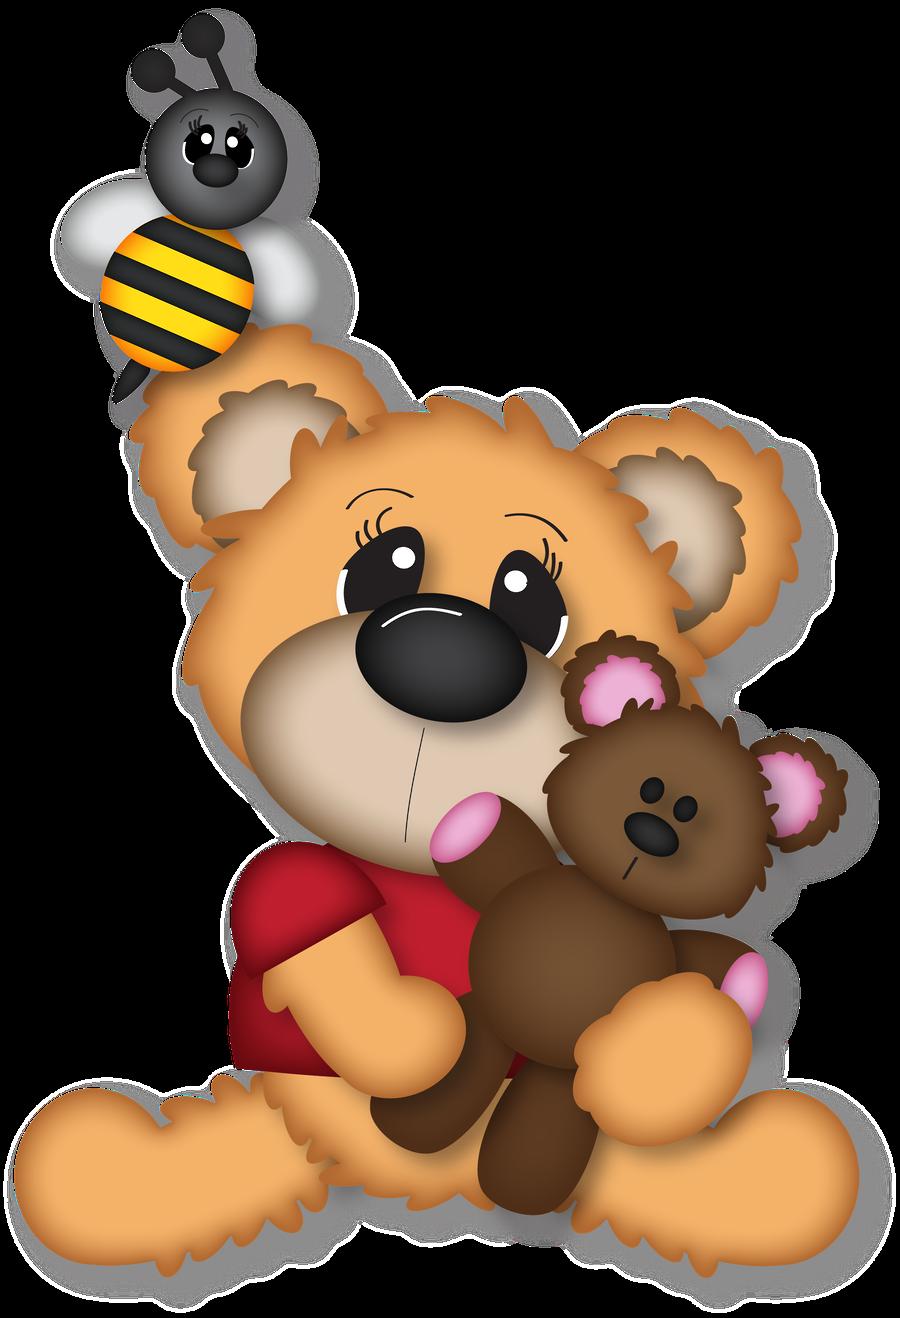 Teddy bear w apple clipart jpg transparent stock Minus - Say Hello! | Pooh | Pinterest | Clip art, Bears and Bear clipart jpg transparent stock